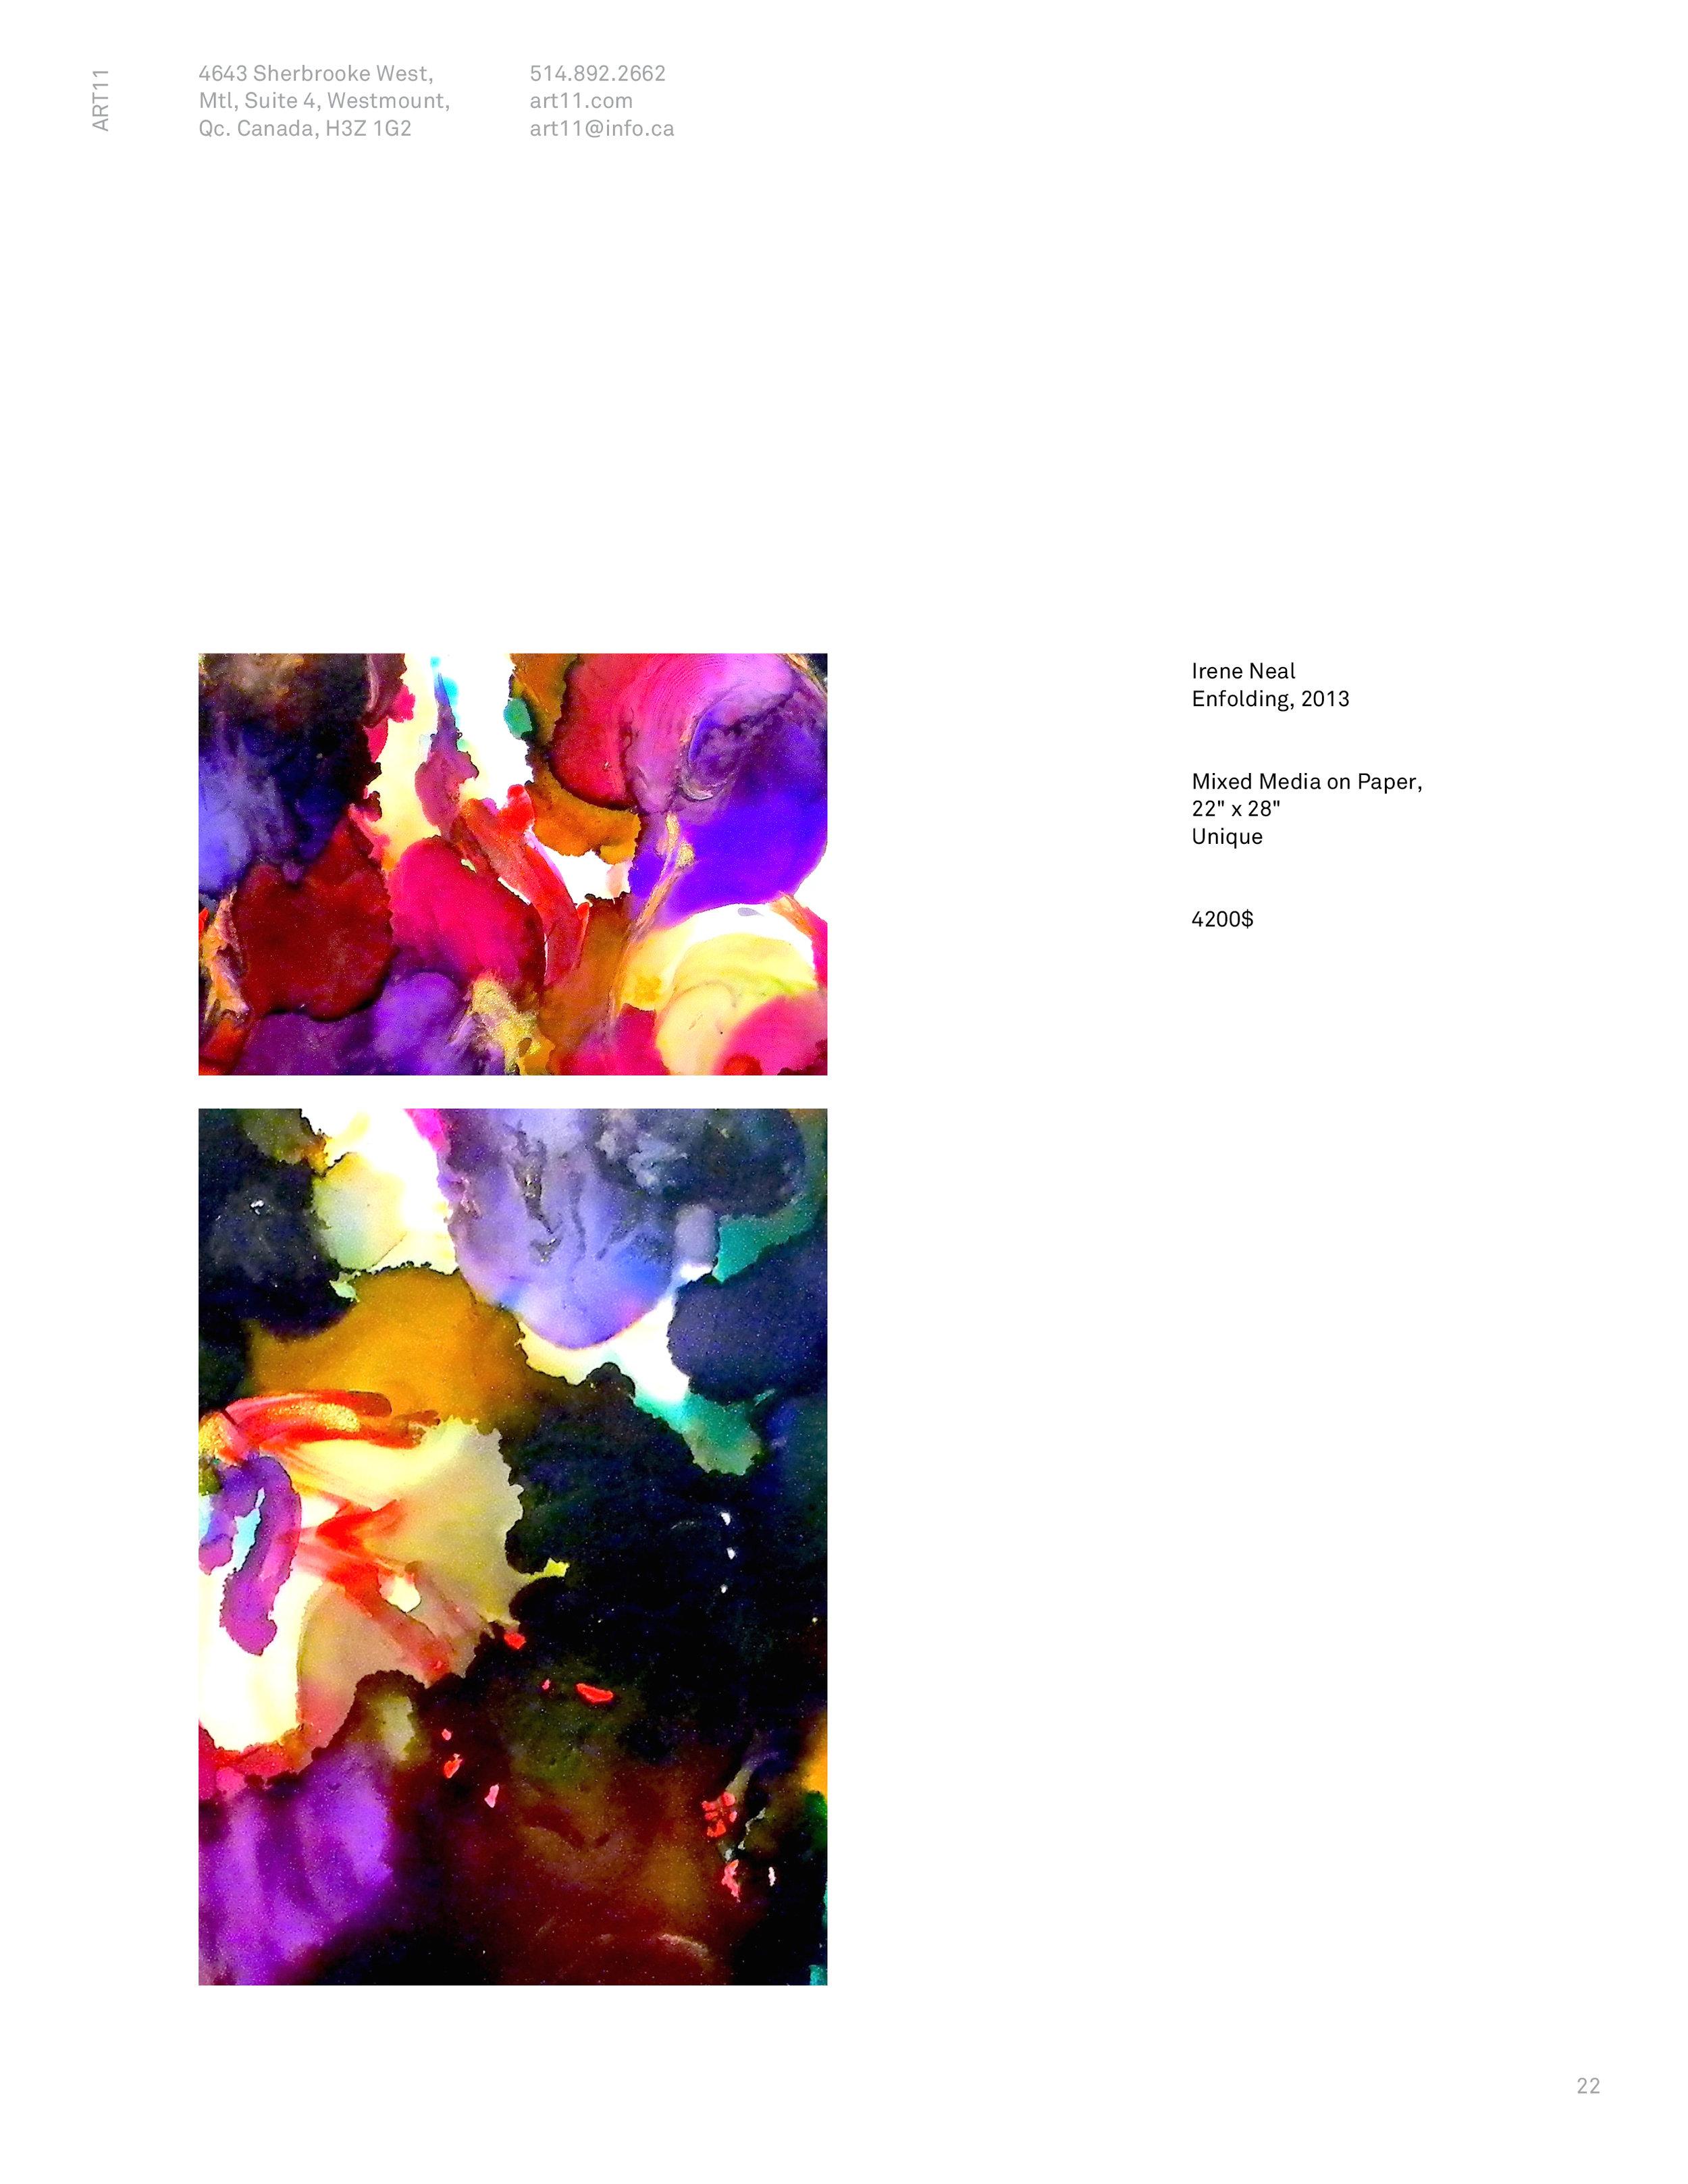 Dossier_Inks_Black Series22.jpg